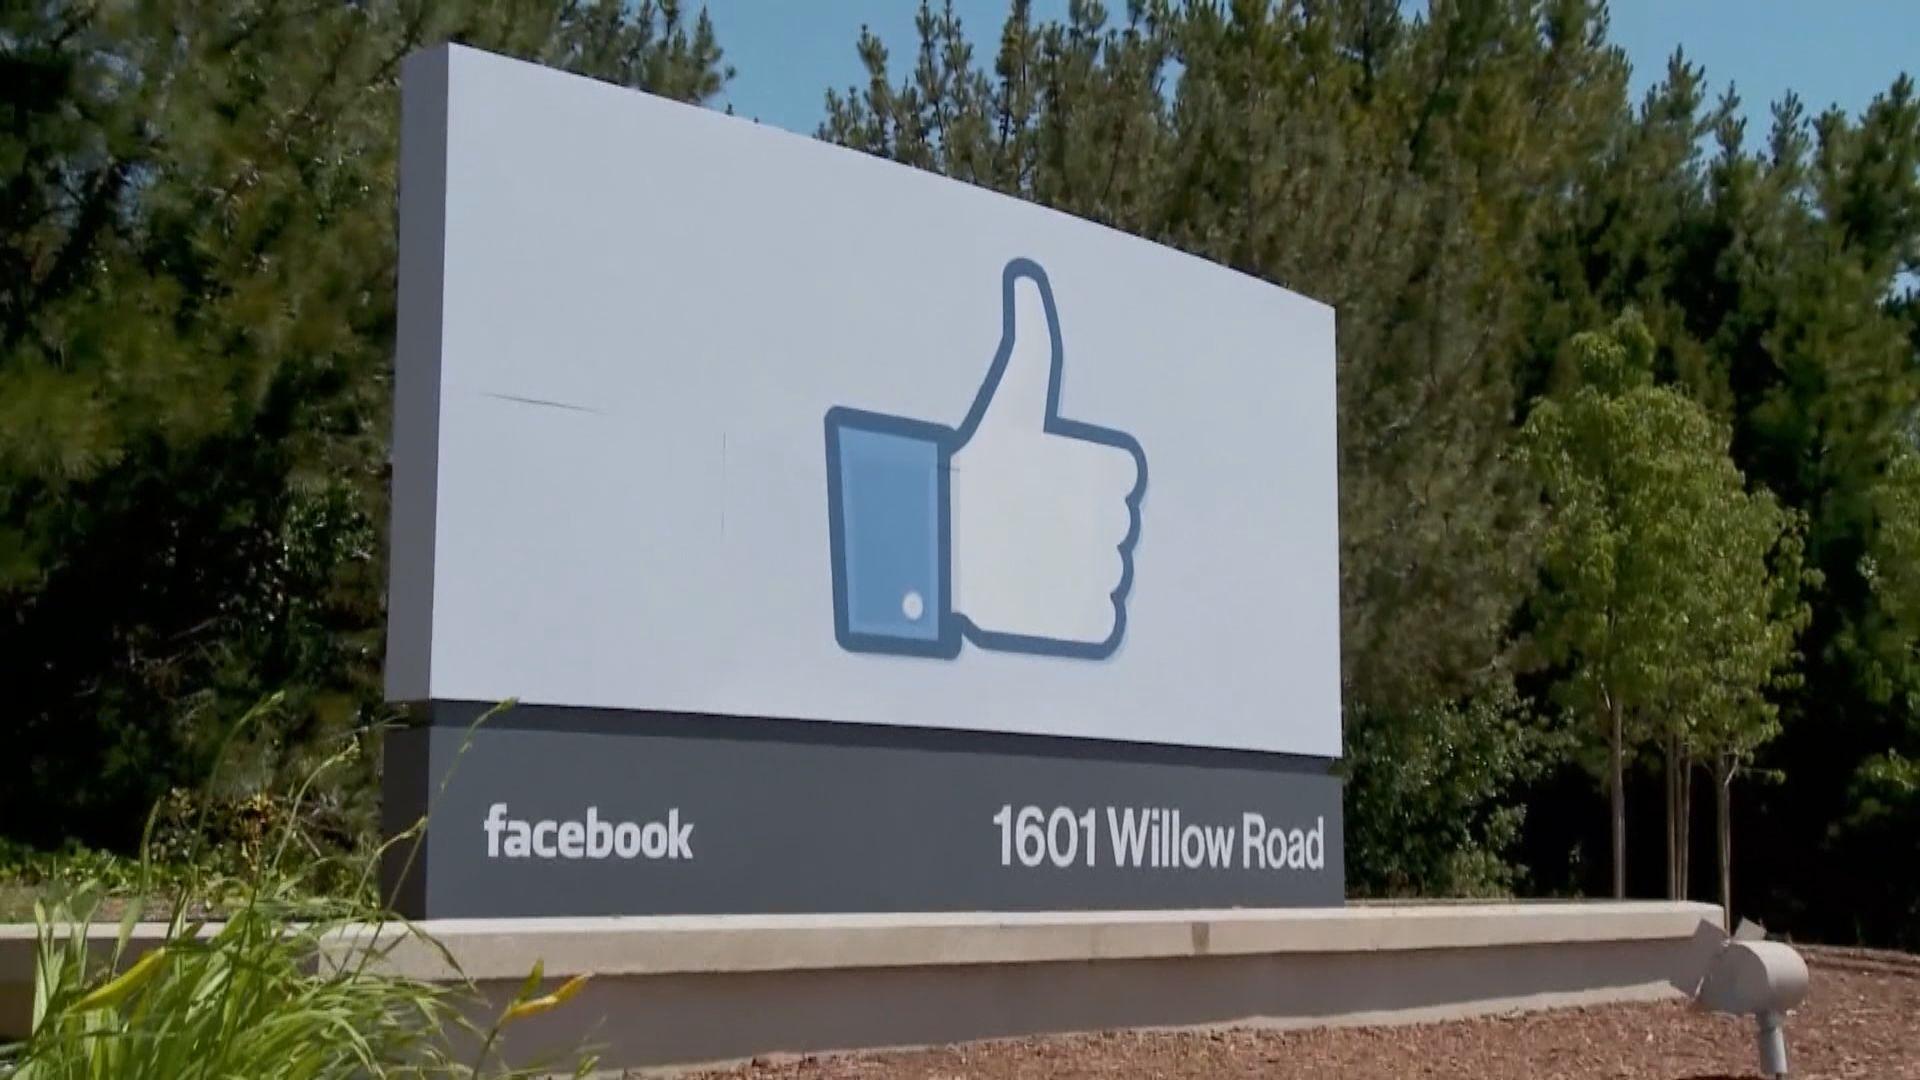 Facebook指私營企業不應審查政治人物和新聞